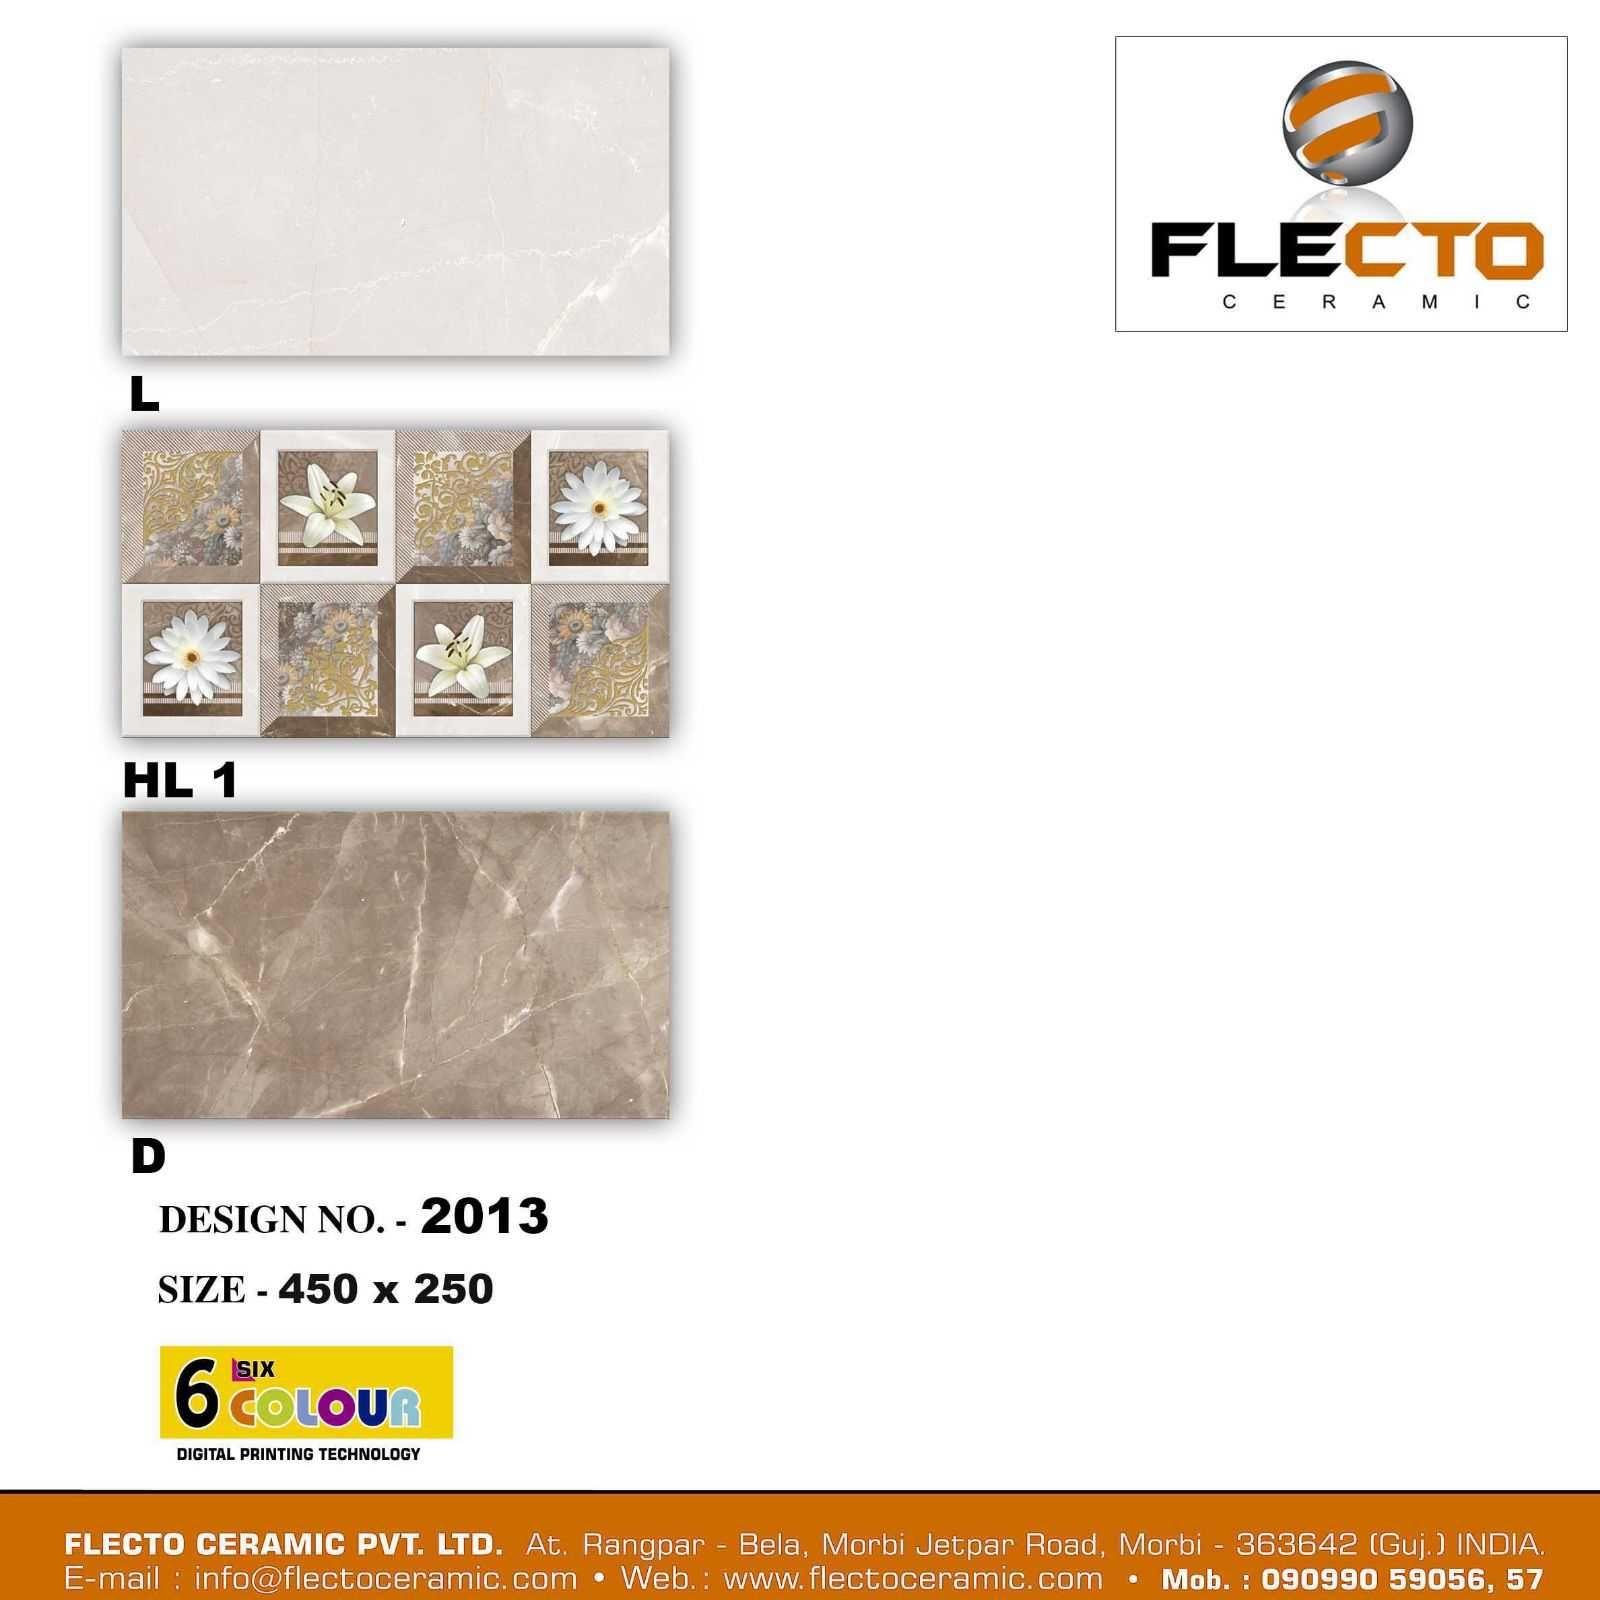 Pin by ceramic directory on flecto ceramic tiles pinterest backsplash tile wall tiles vitrified tiles tile manufacturers tile design glossier porcelain ceramics envelope dailygadgetfo Images